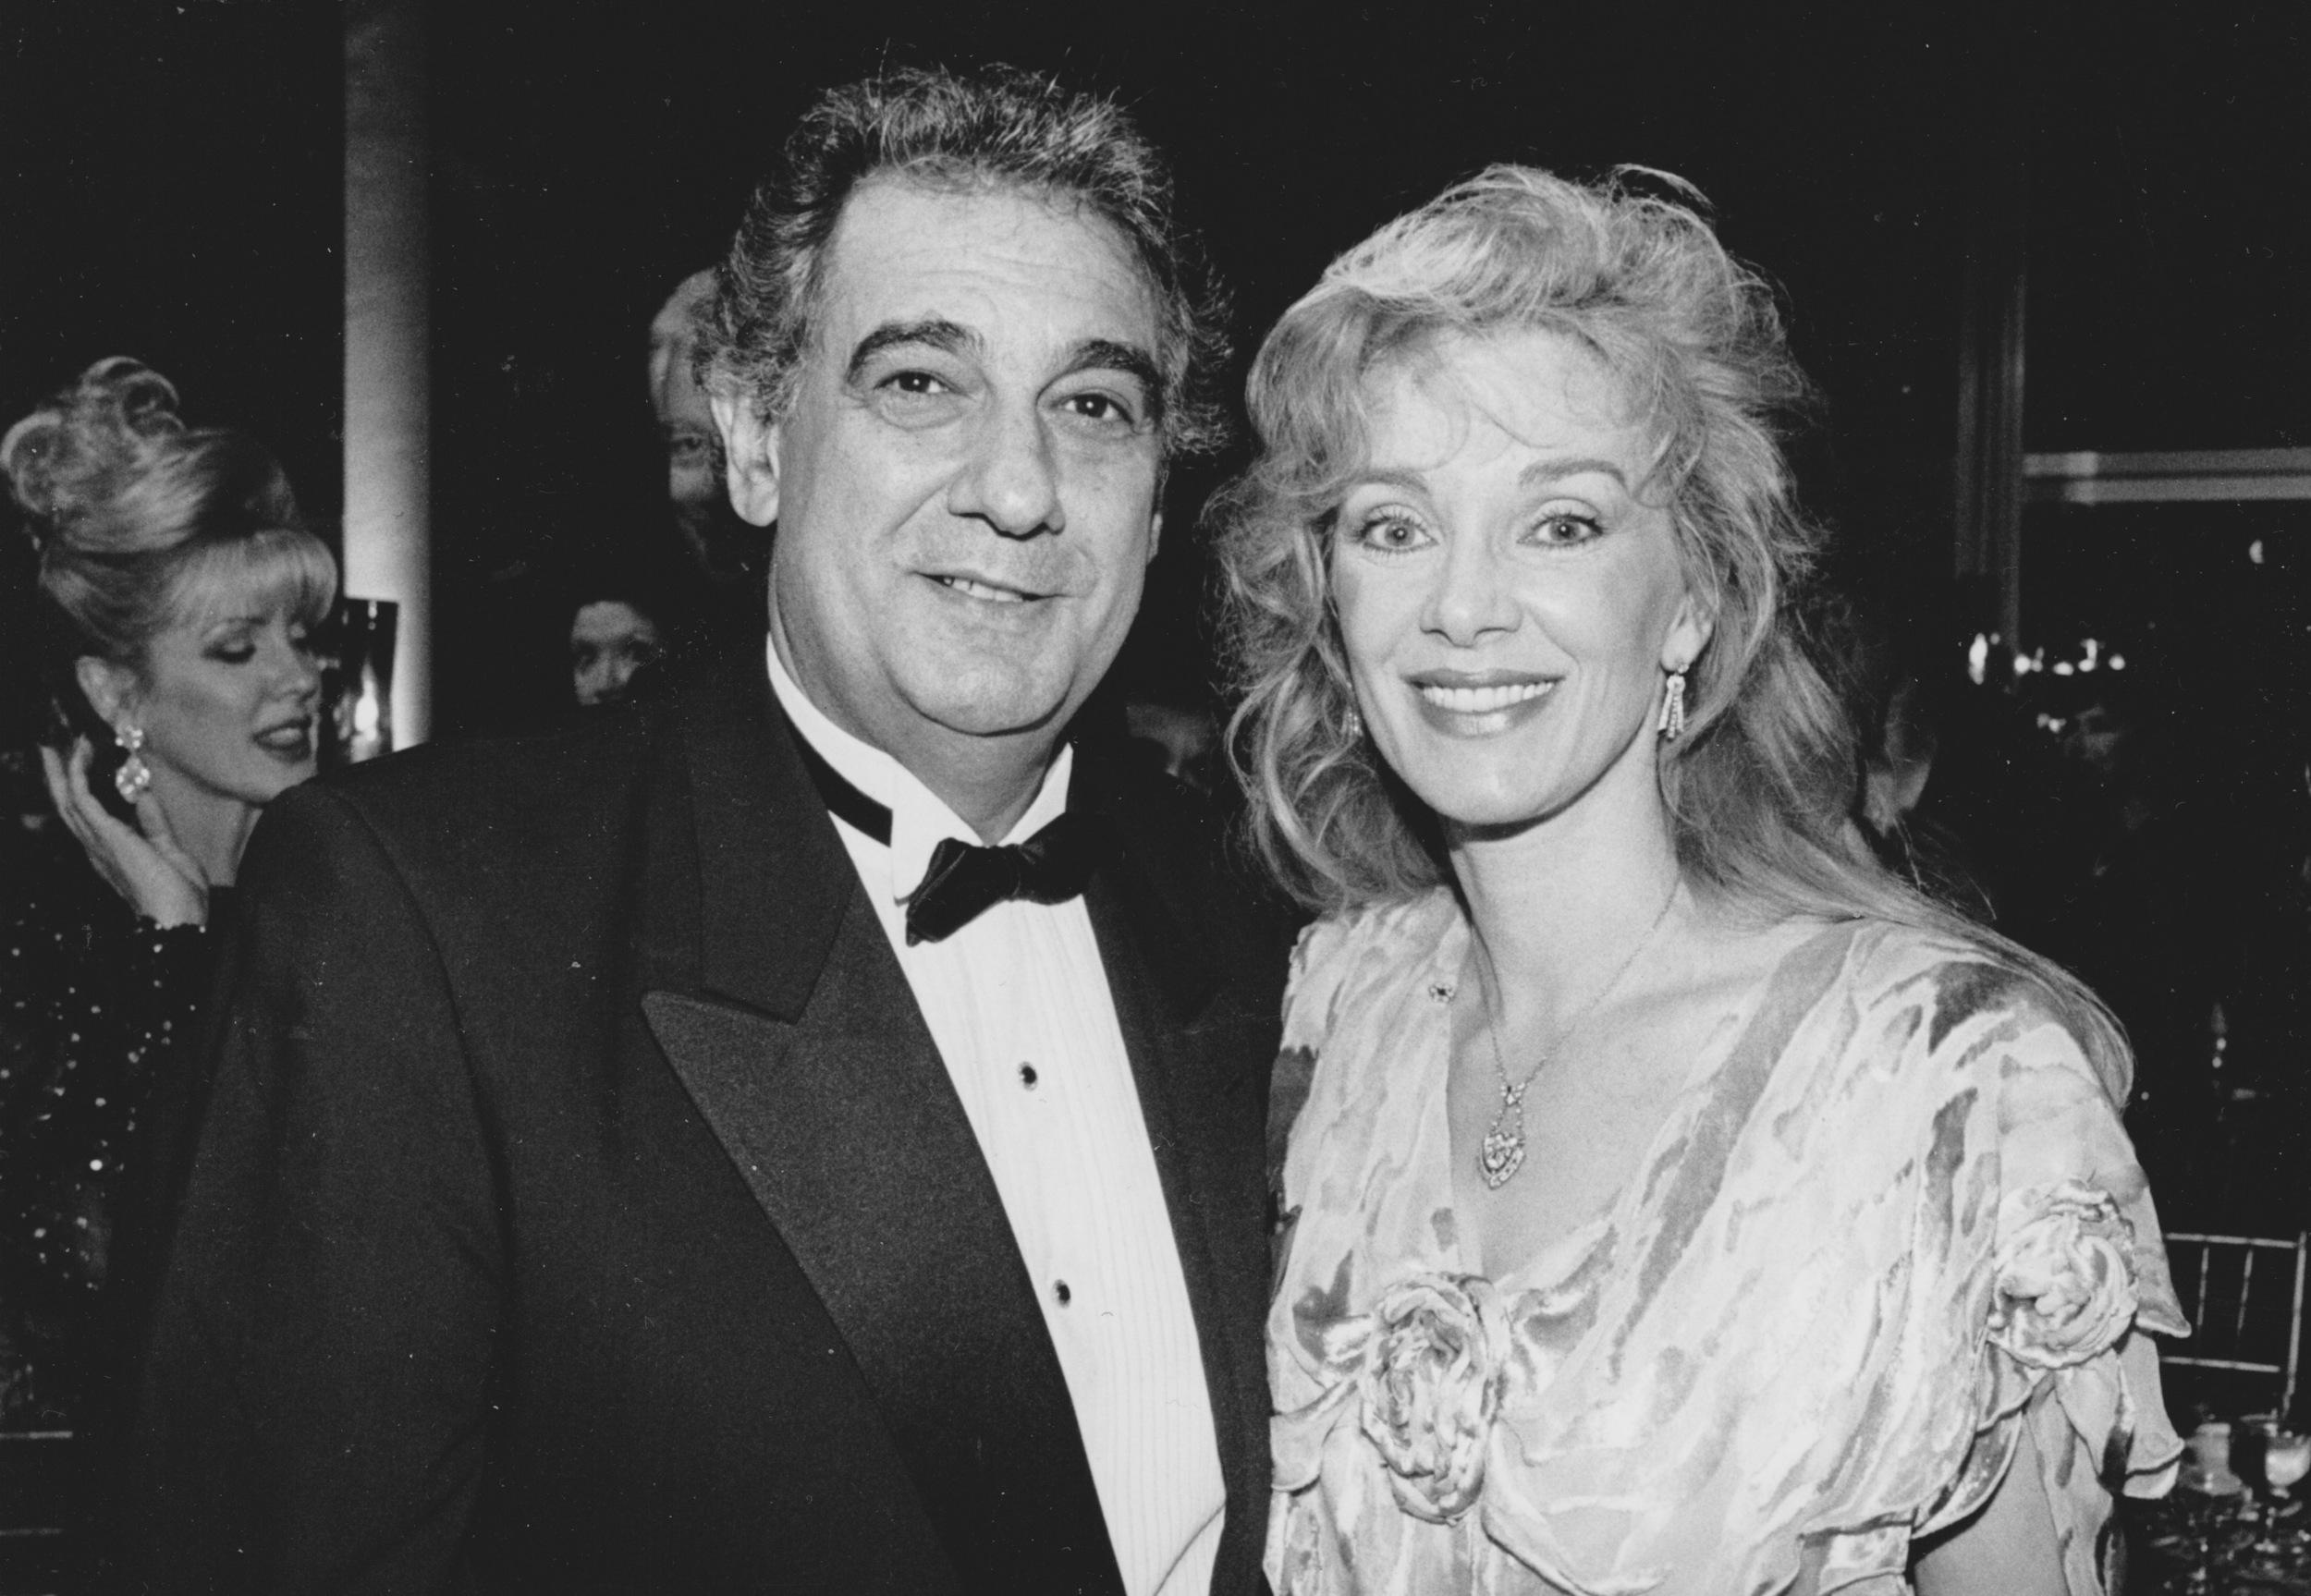 1995 with Placido Domingo